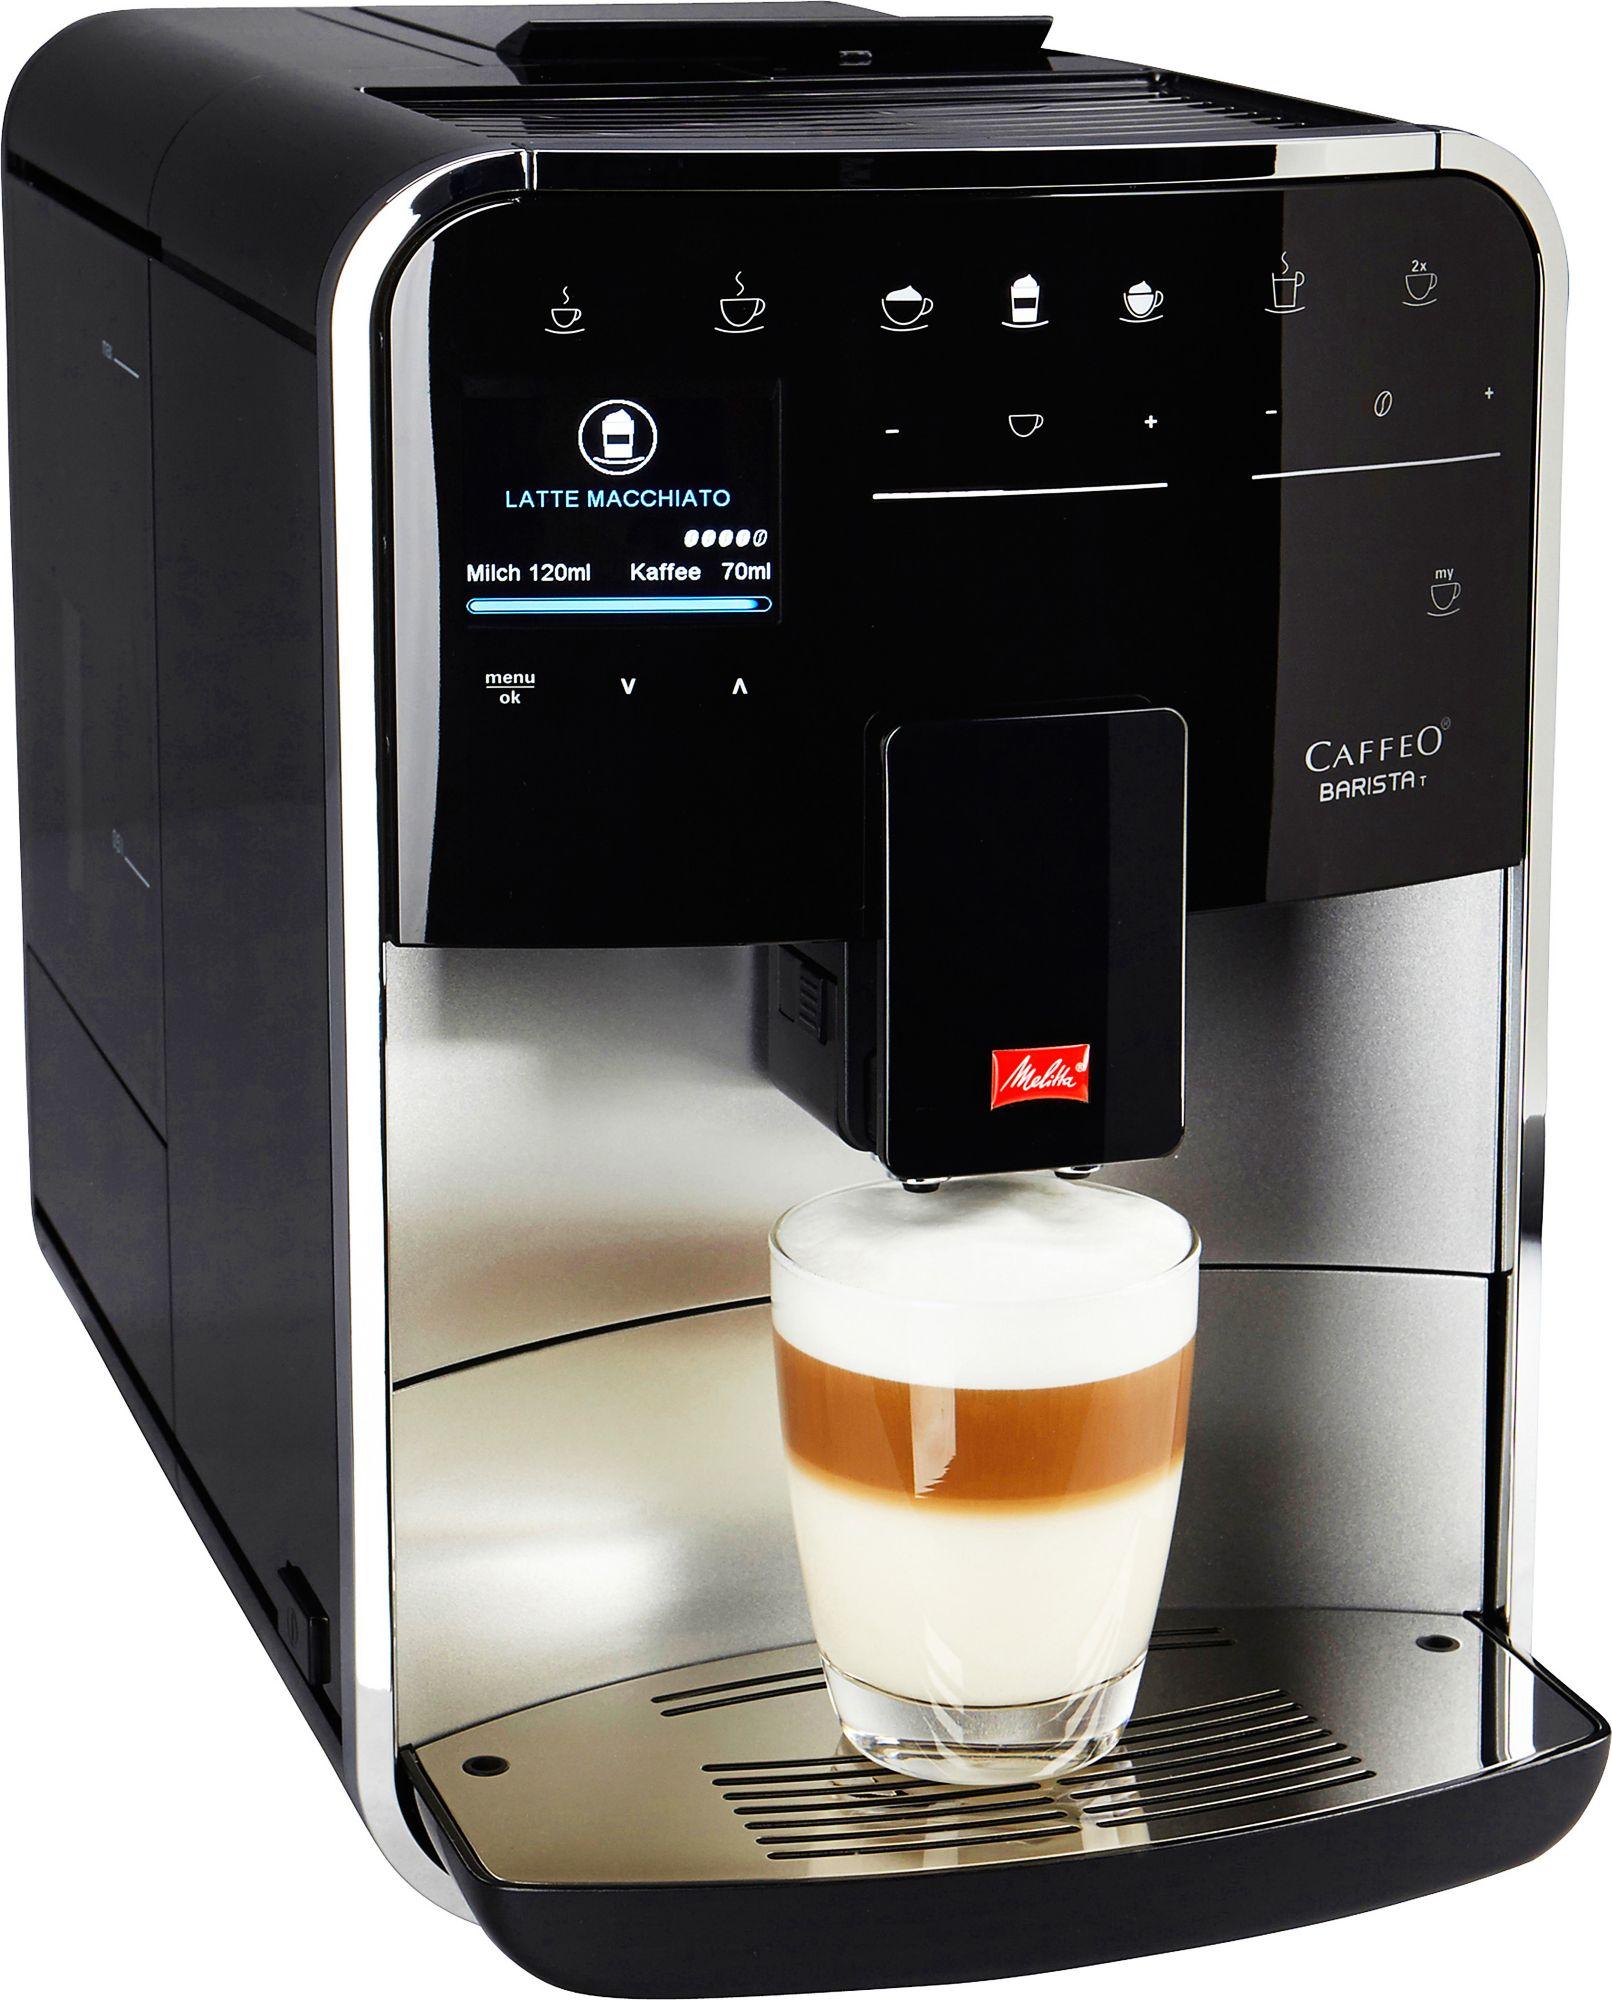 MELITTA Caffeo Barista T F 73/1-101, Vollautomat